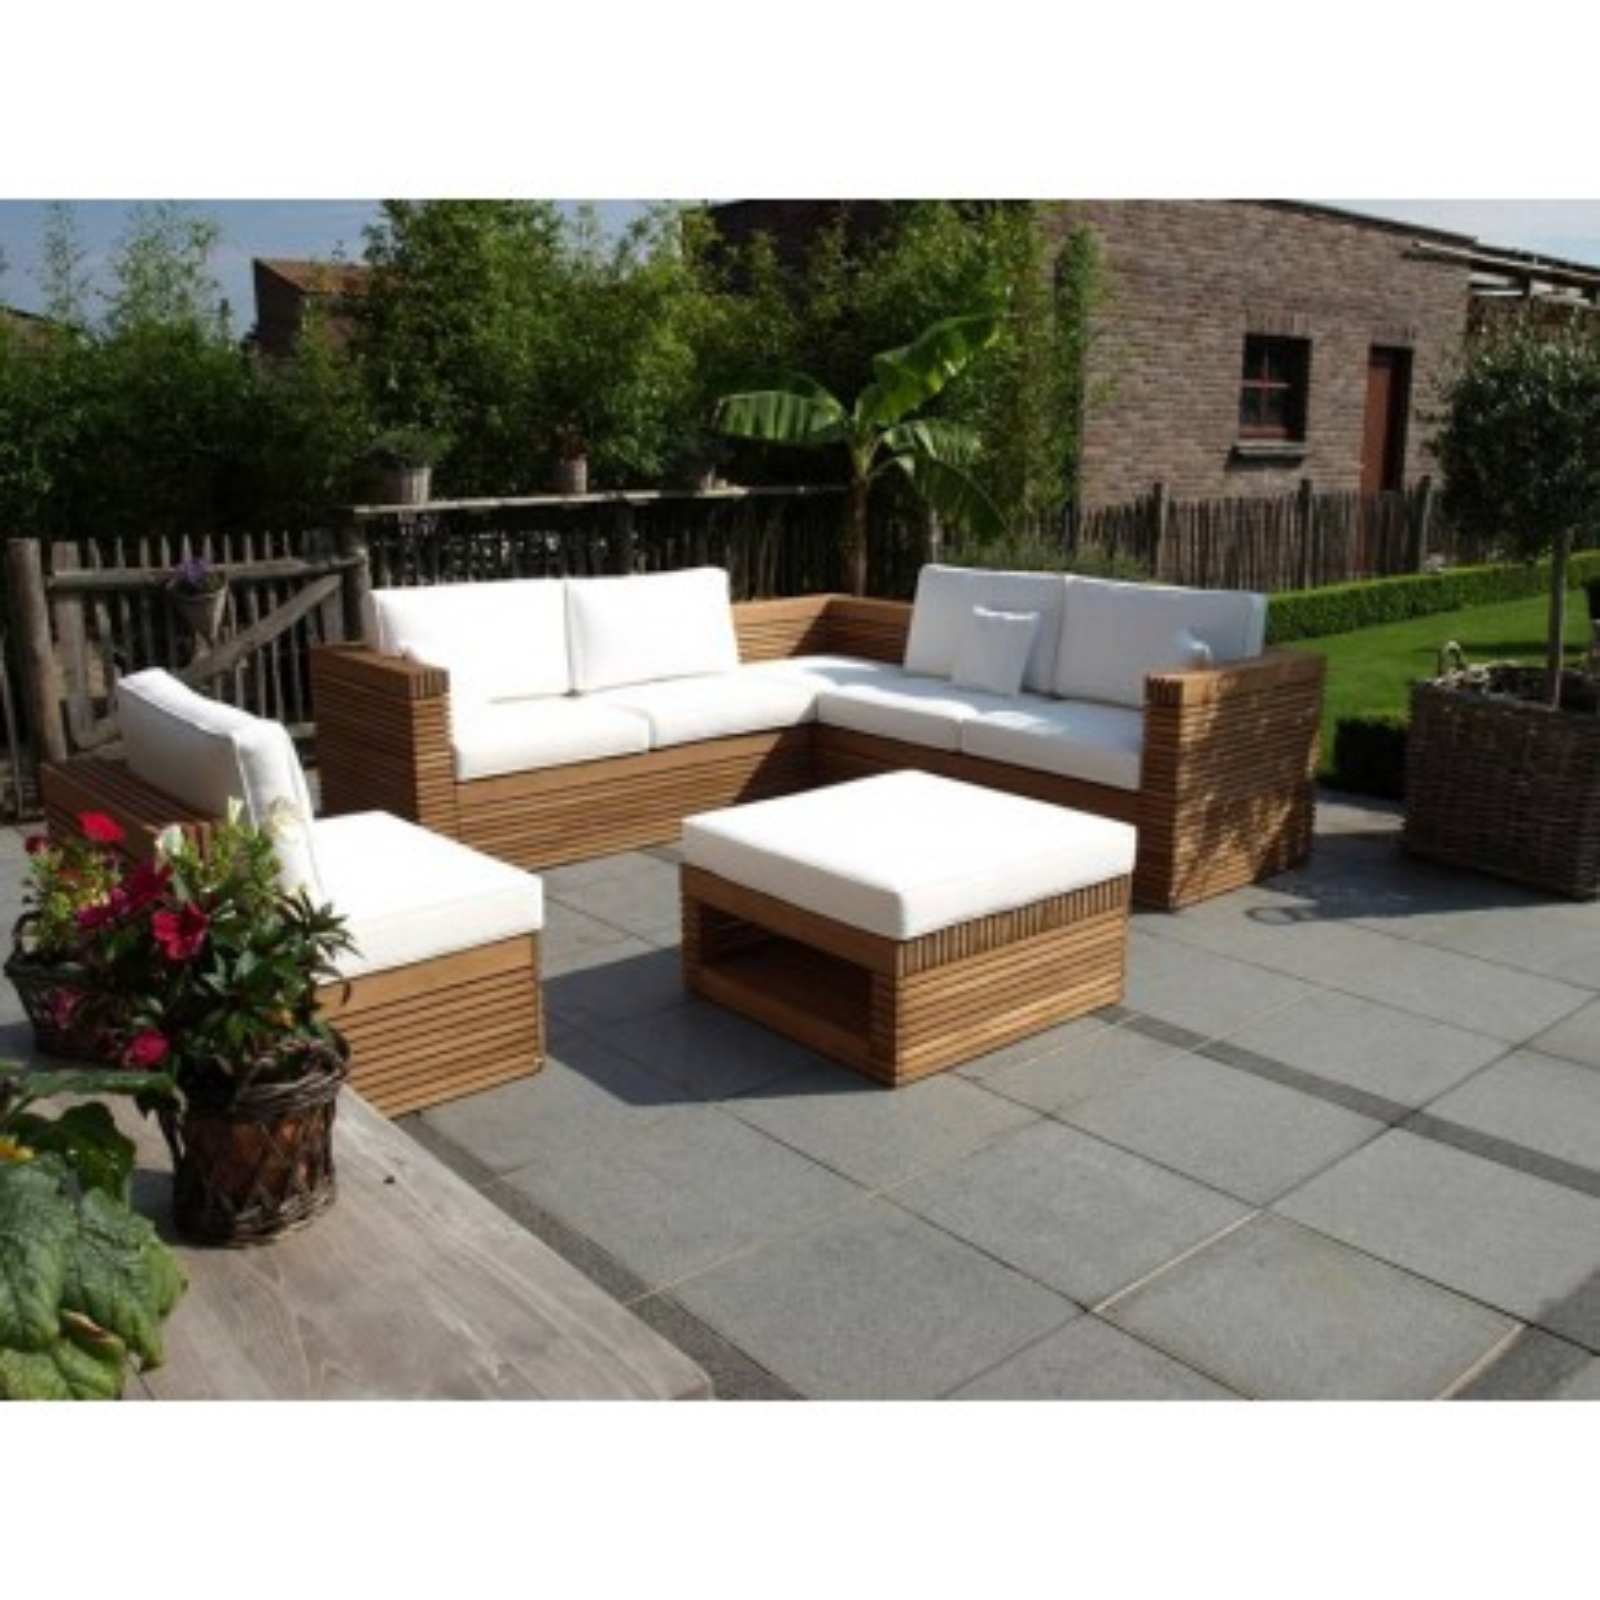 Salon de jardin Vicio en bois exotique | Style design